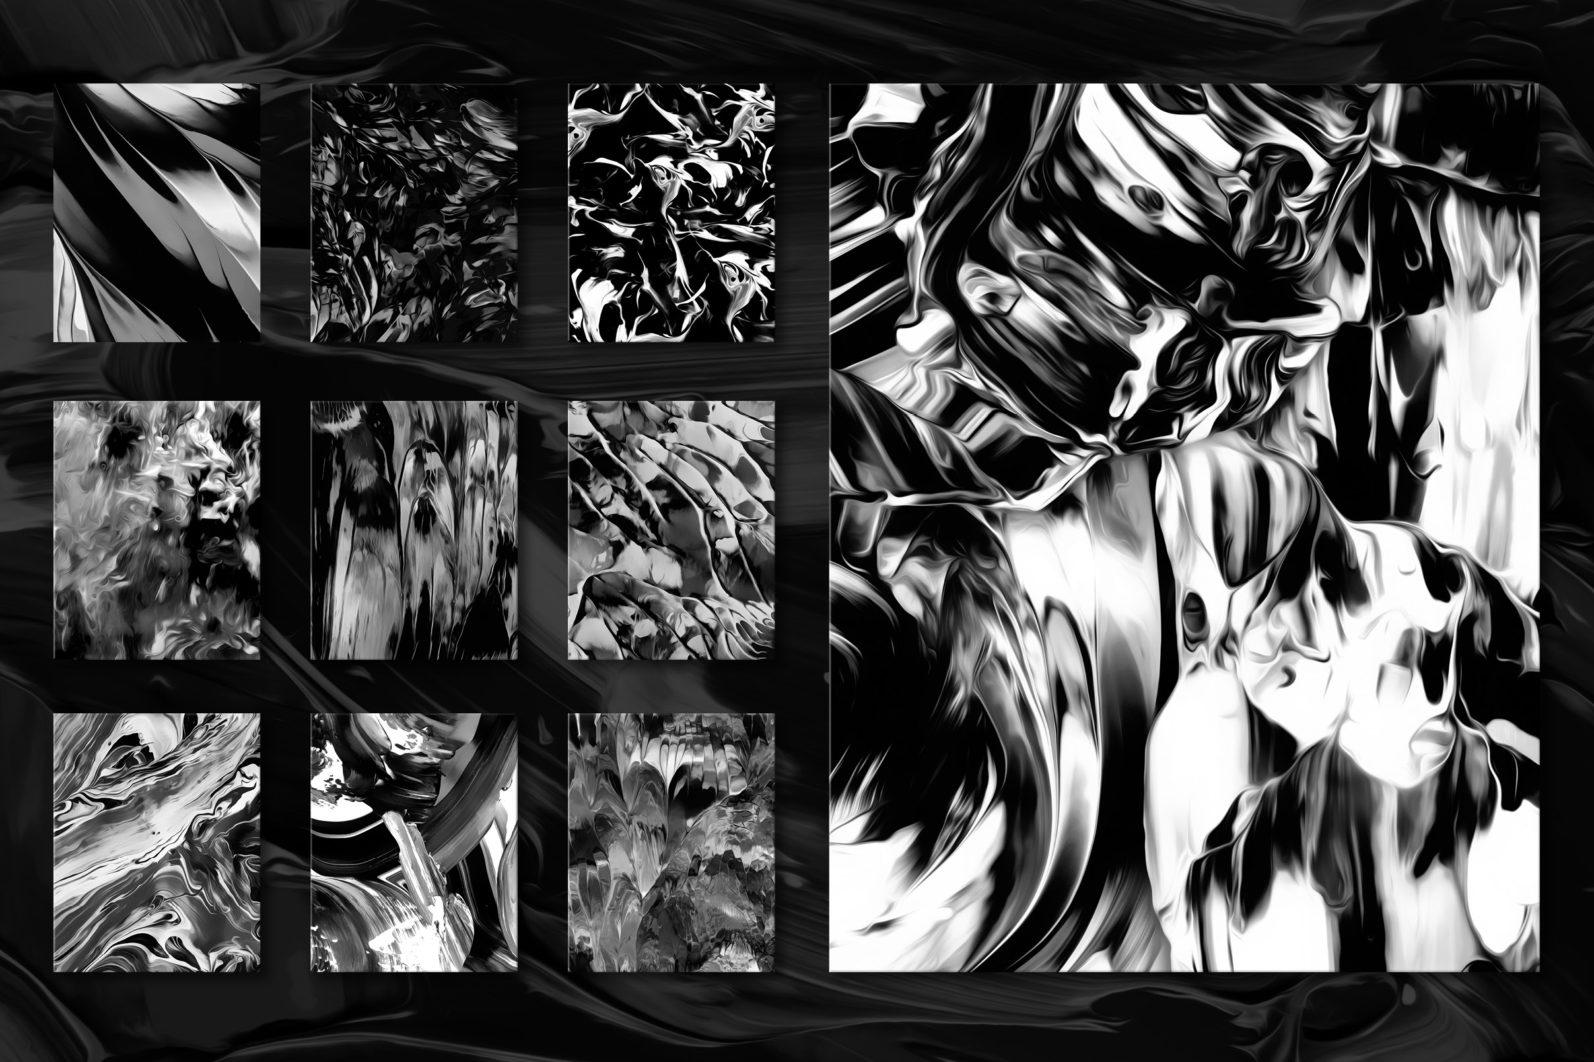 Flow, Vol. 2: 100 Smooth Paint Textures - Flow Vol 2 Preview 07 -